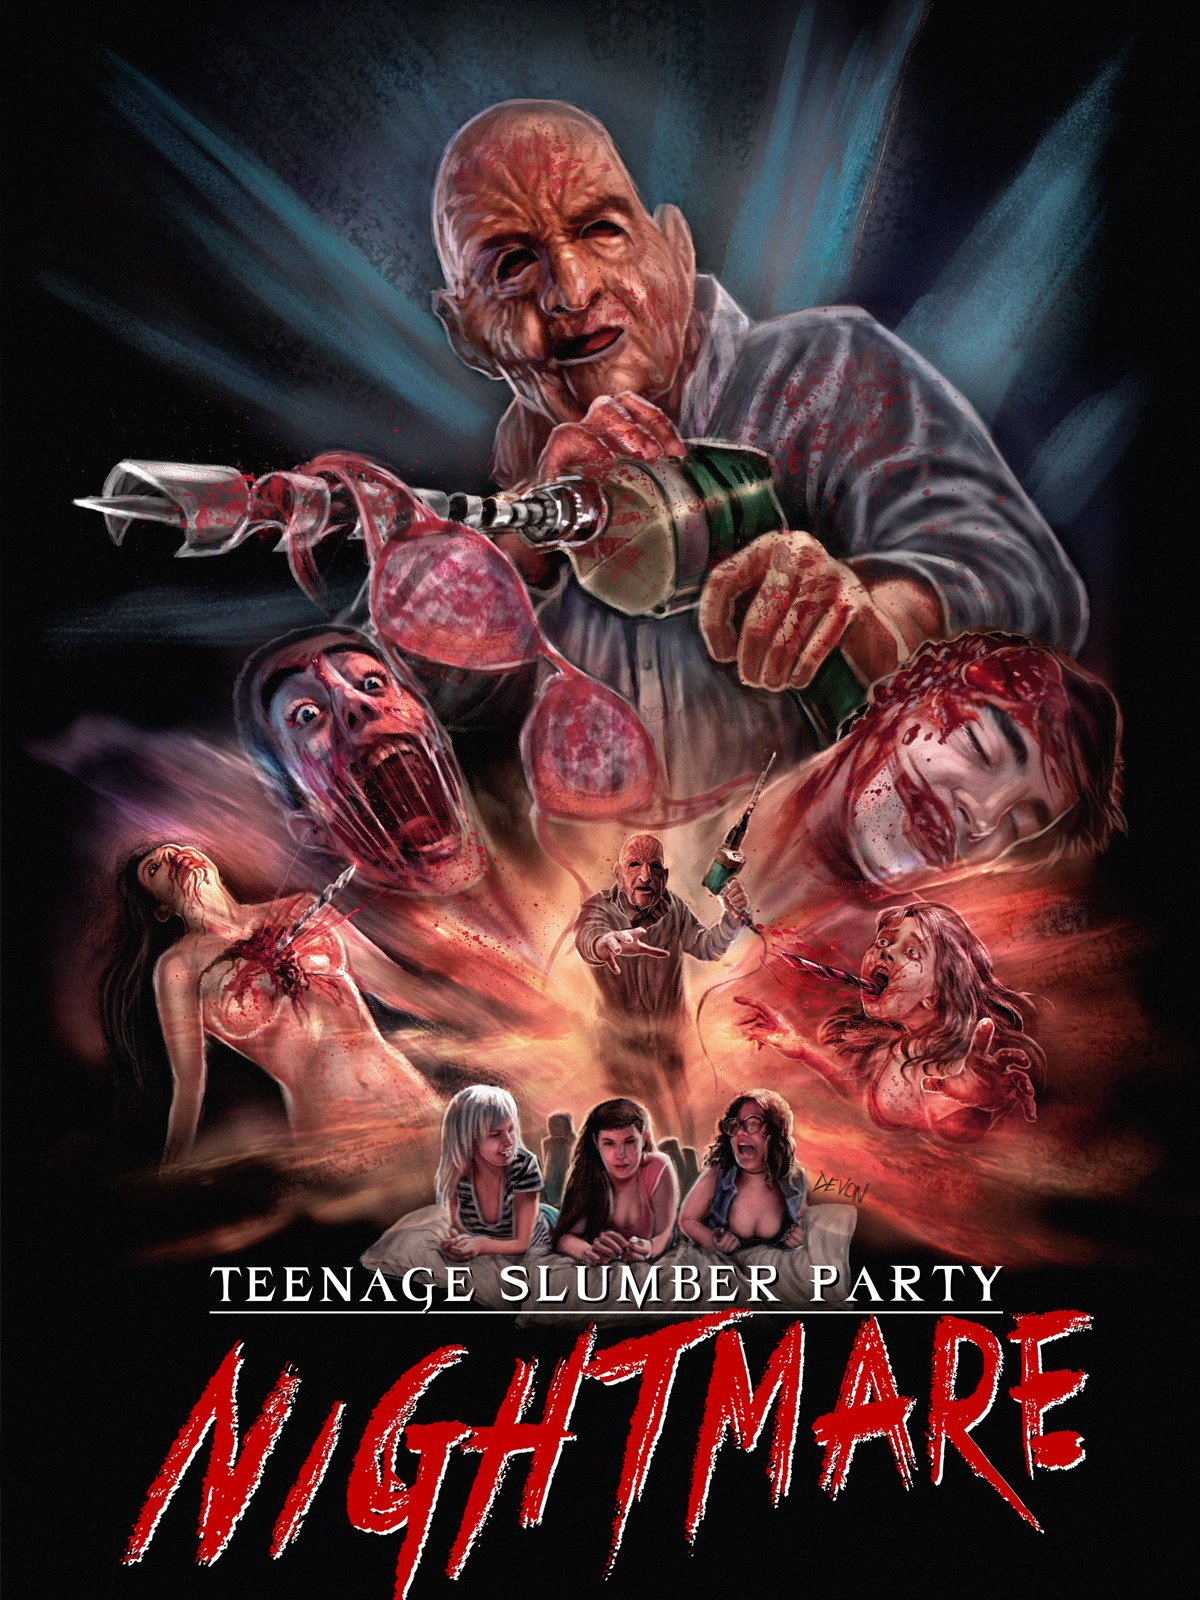 Teenage Slumber Party Nightmare